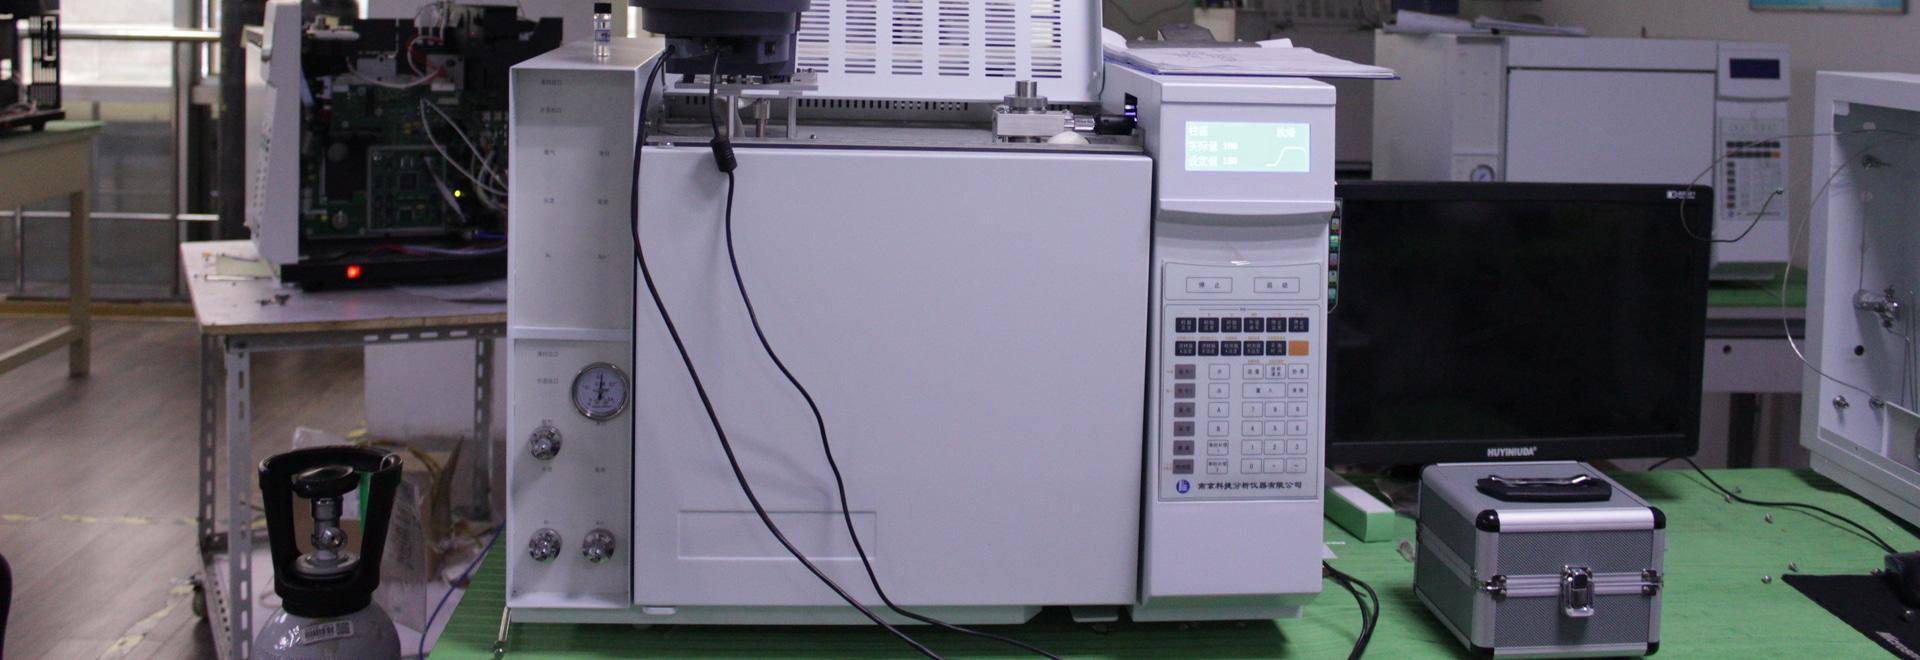 hplc gas chromatography - Dongguan, Guangdong, China - HAIDA